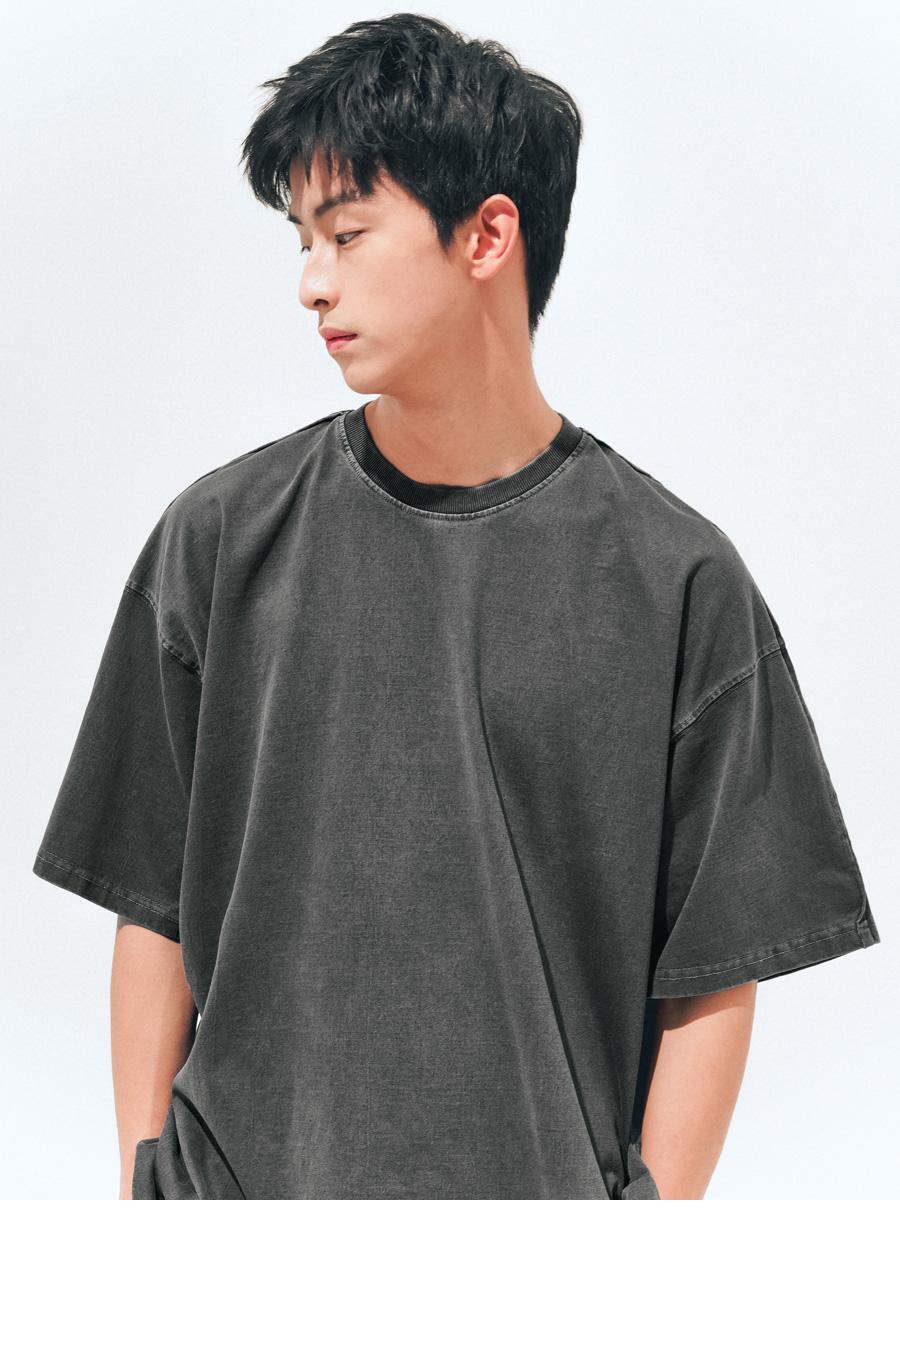 20200522_dy_sidecut_tshirts_model_sh_01.jpg